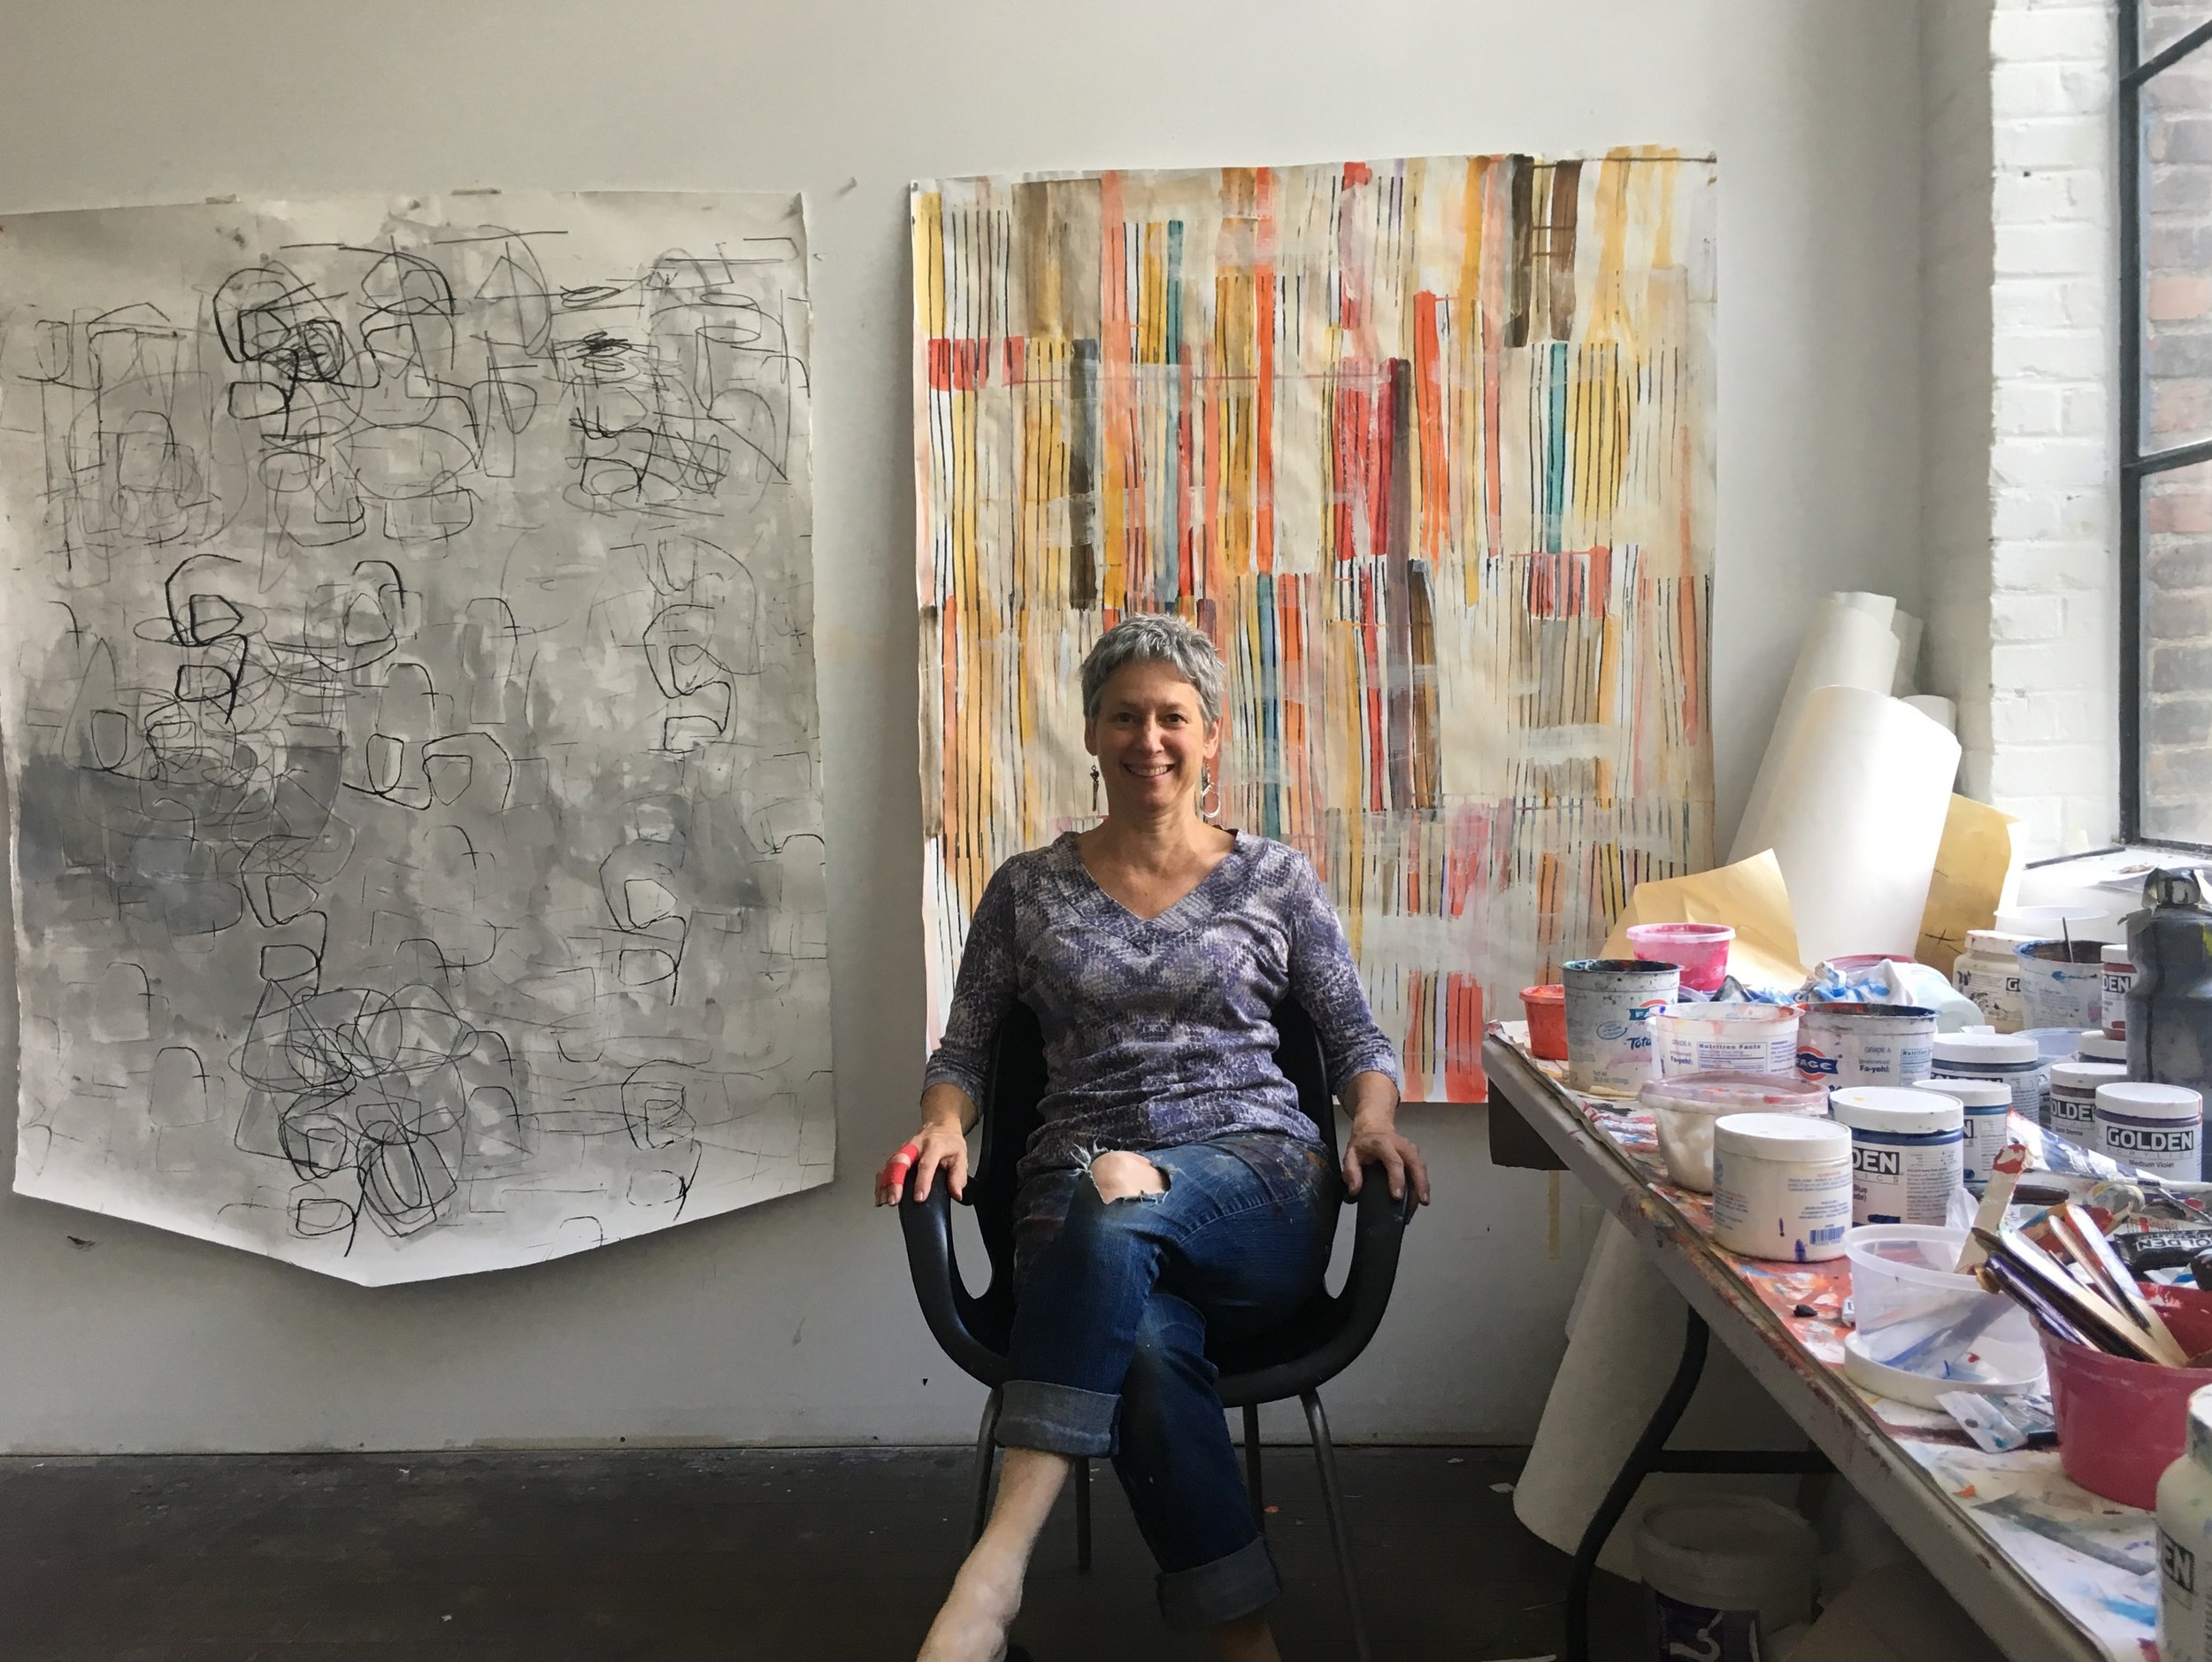 barbara smith gioia in her studio